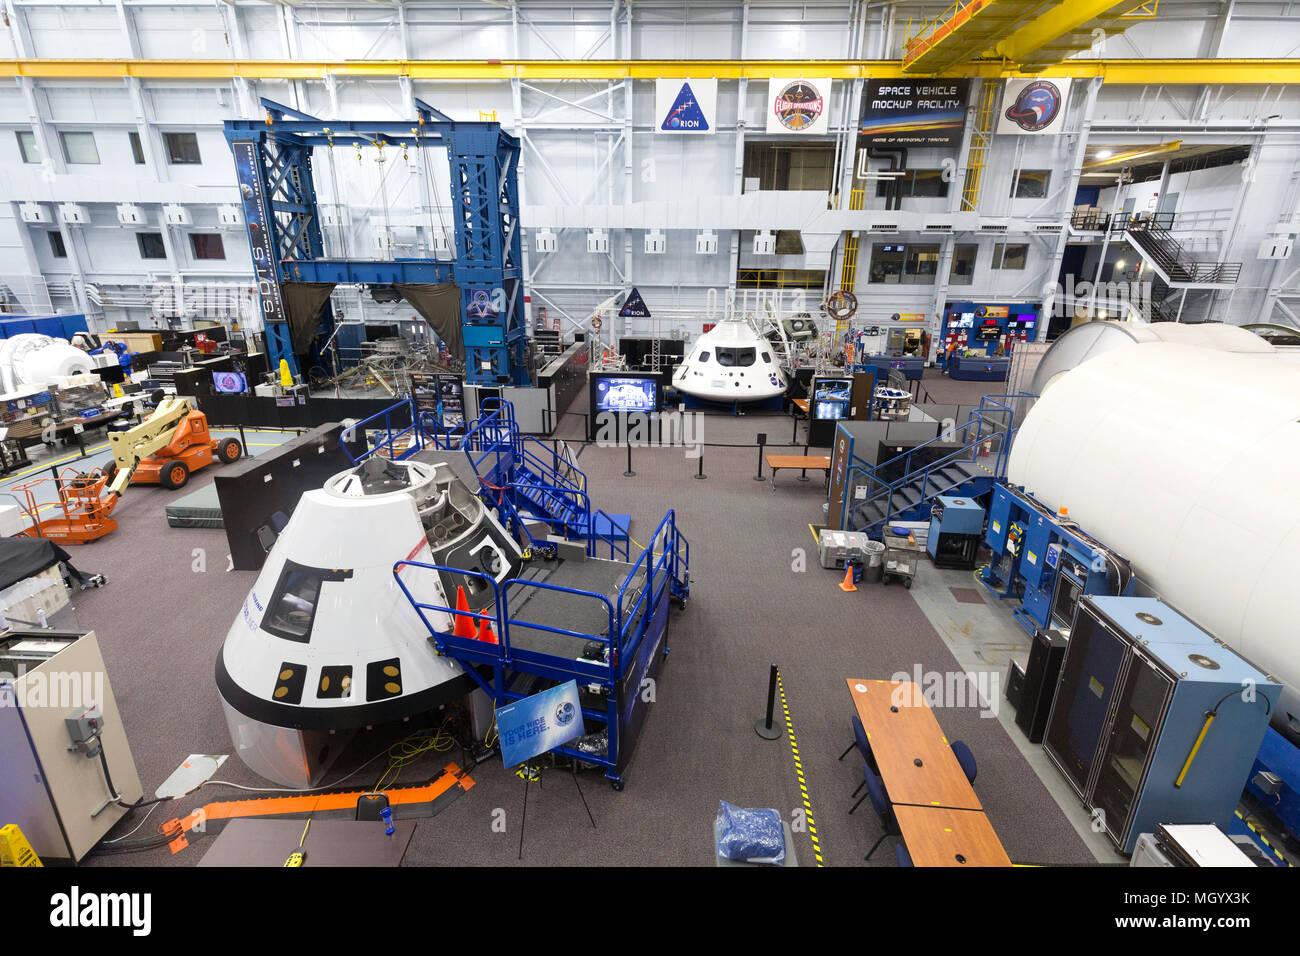 The Space Vehicle Mockup Facility for astronaut training at NASA Johnson Space Center, Houston Texas USA - Stock Image